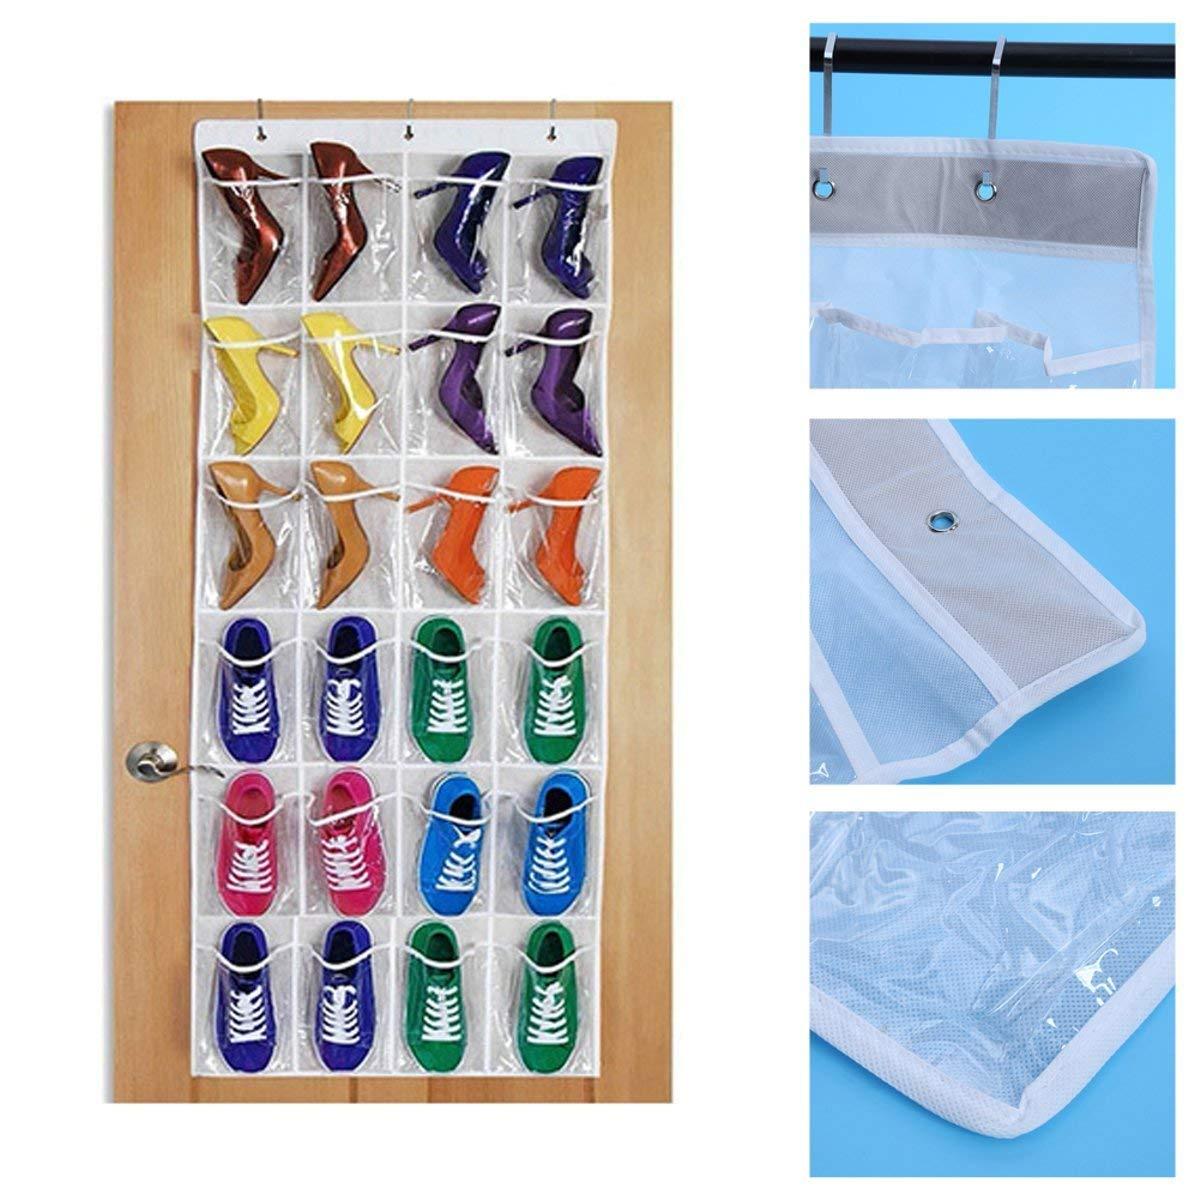 Buy 24 Clear Pockets Over The Door Hanging Shoe Organizer ...